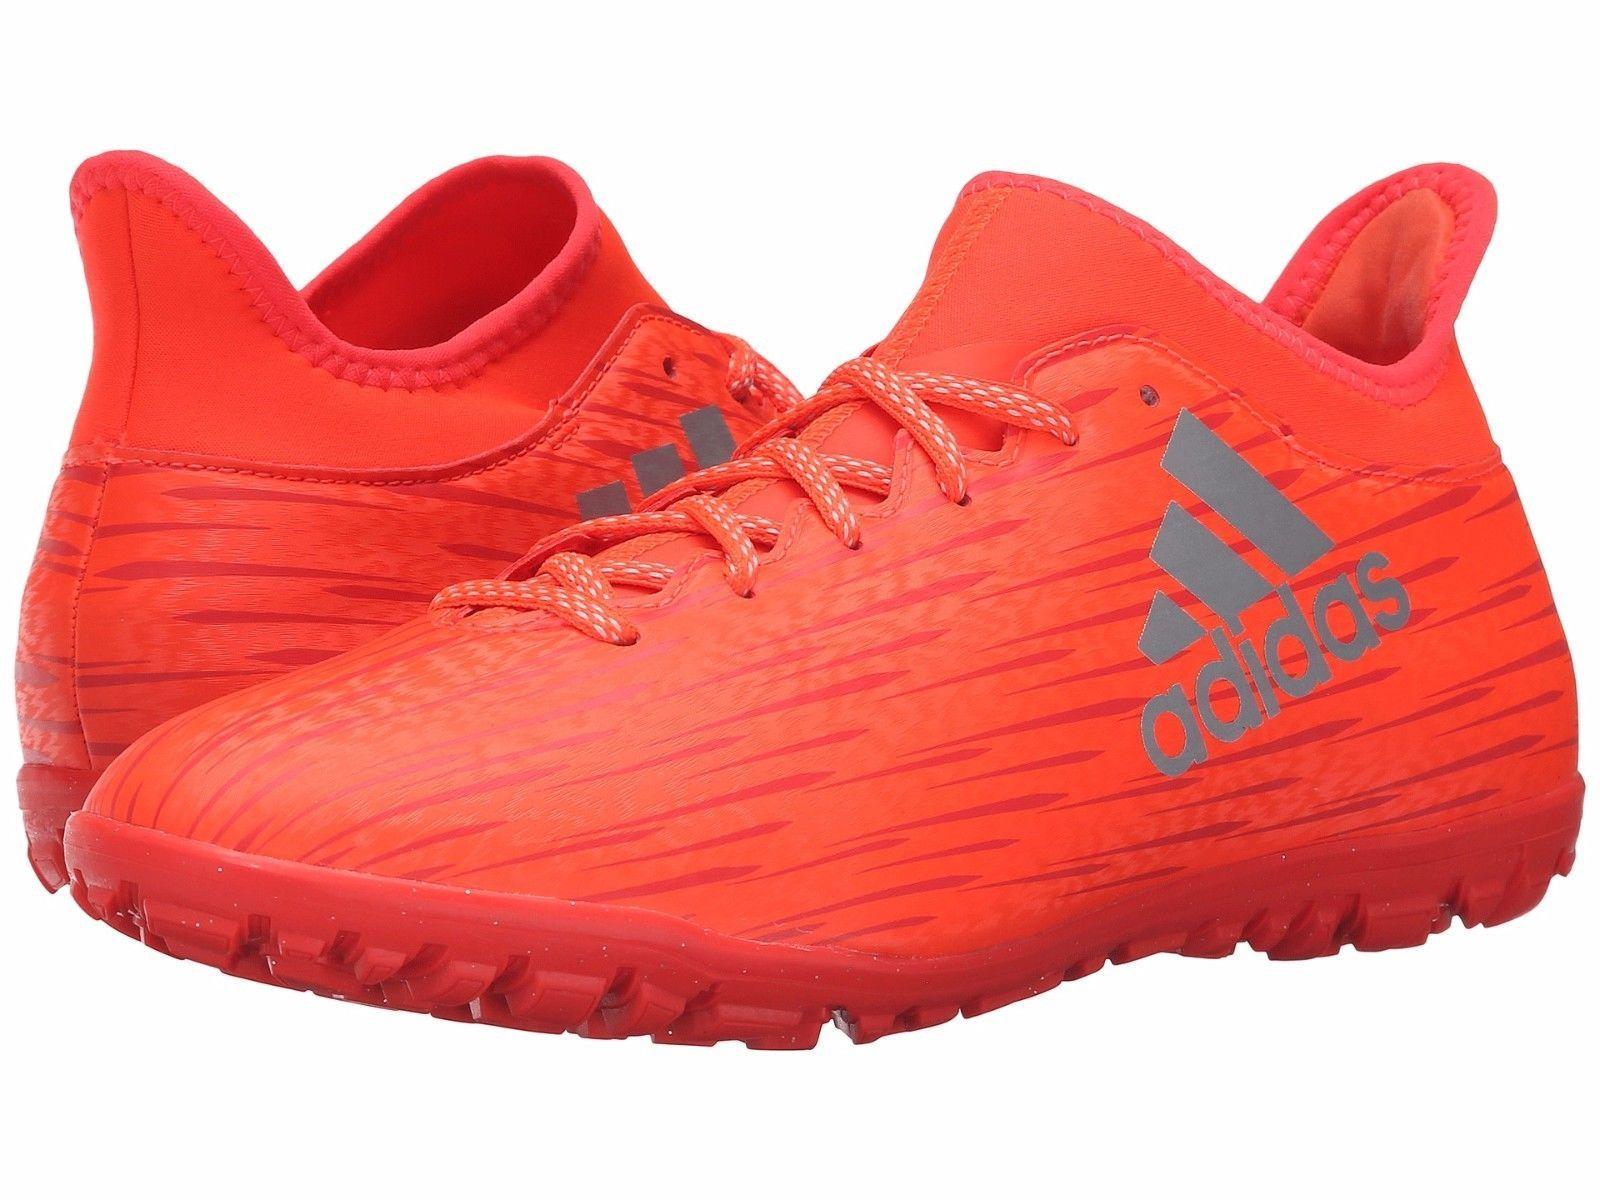 Adidas X 16.3 TF NEW 2016 Soccer TURF Shoes MENs Orange